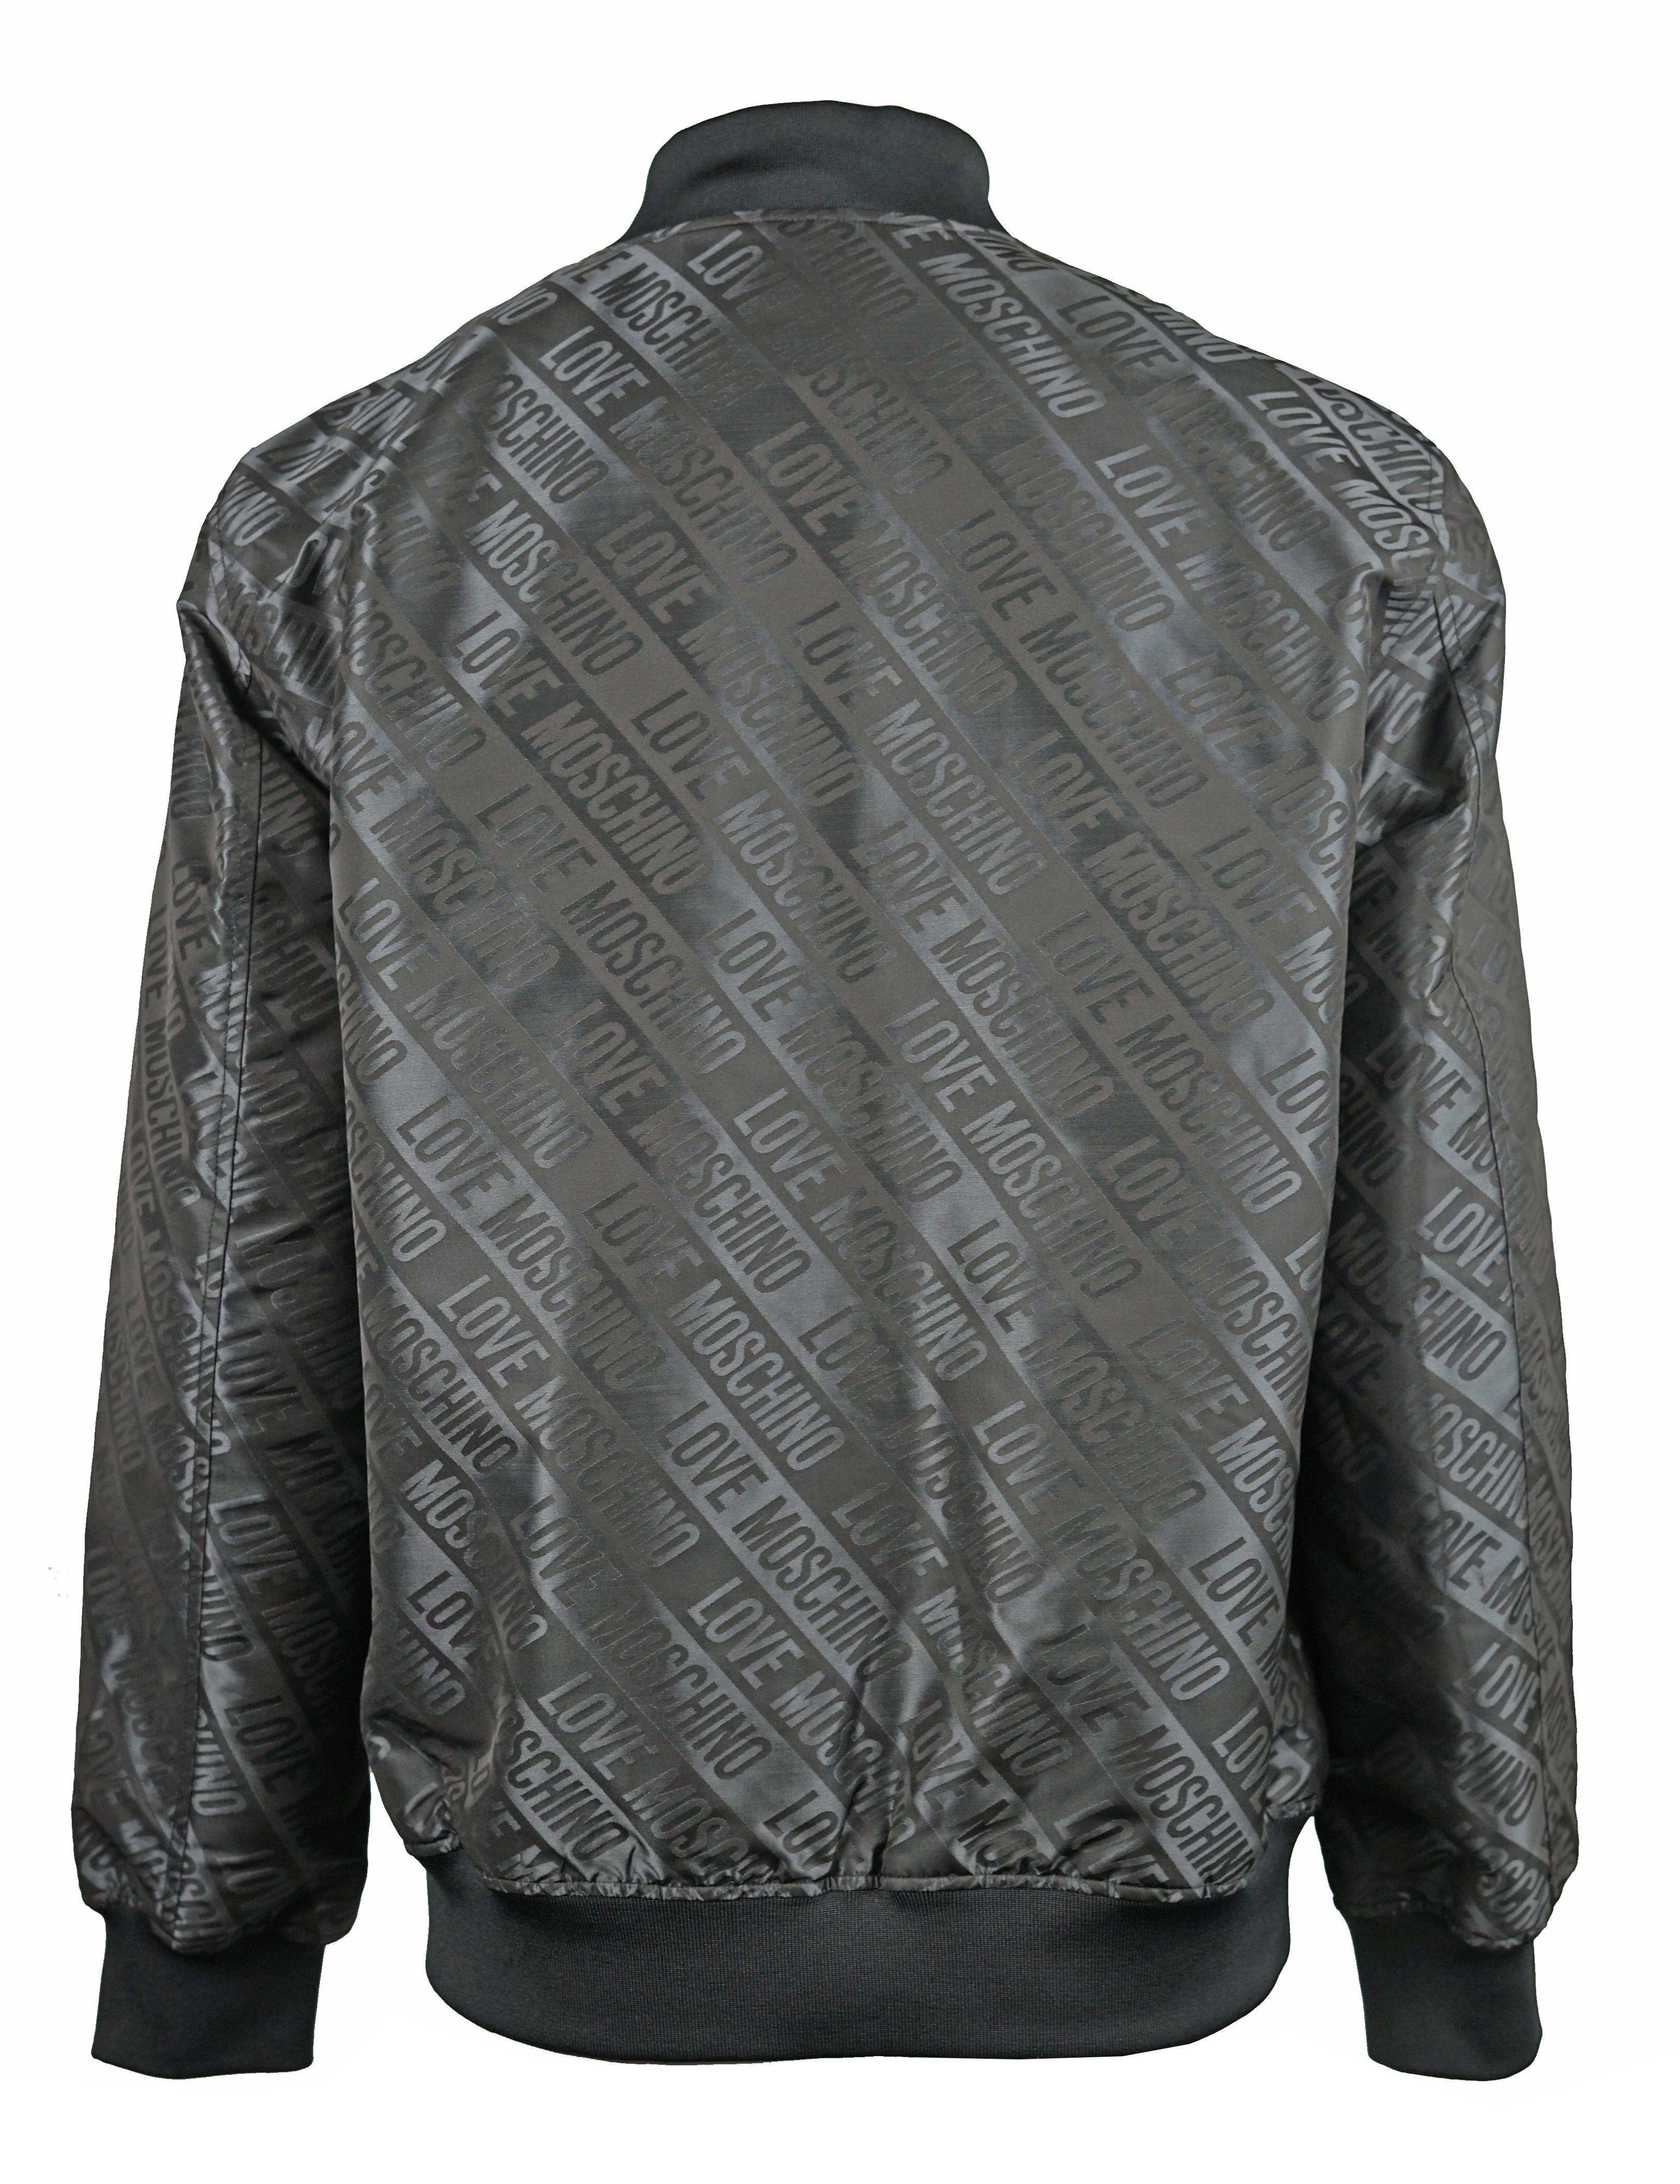 Love Moschino M H 753 00 T 9698 Black 6003 Jacket